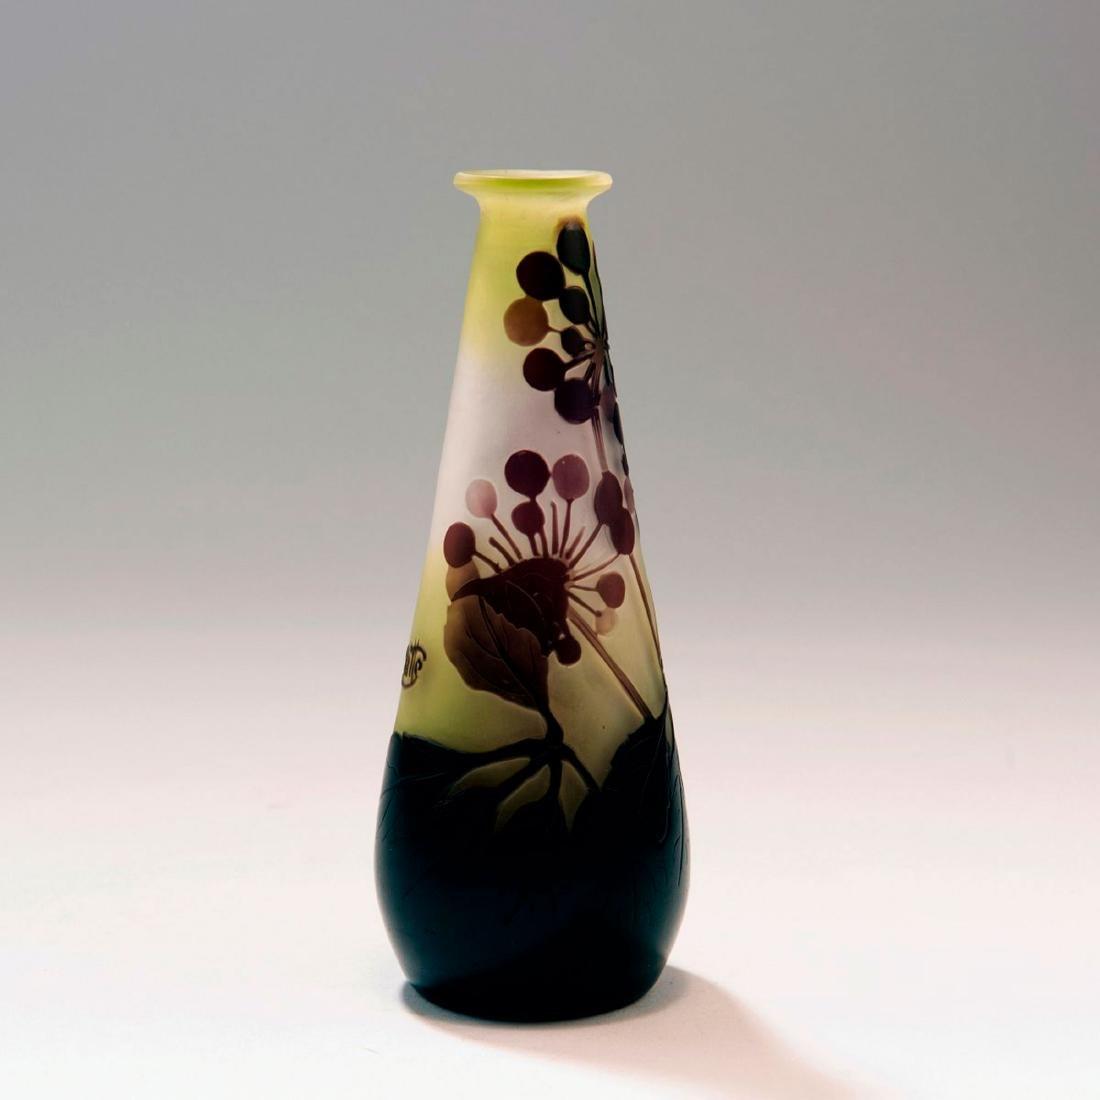 Small 'Ombelles' vase, 1906-14